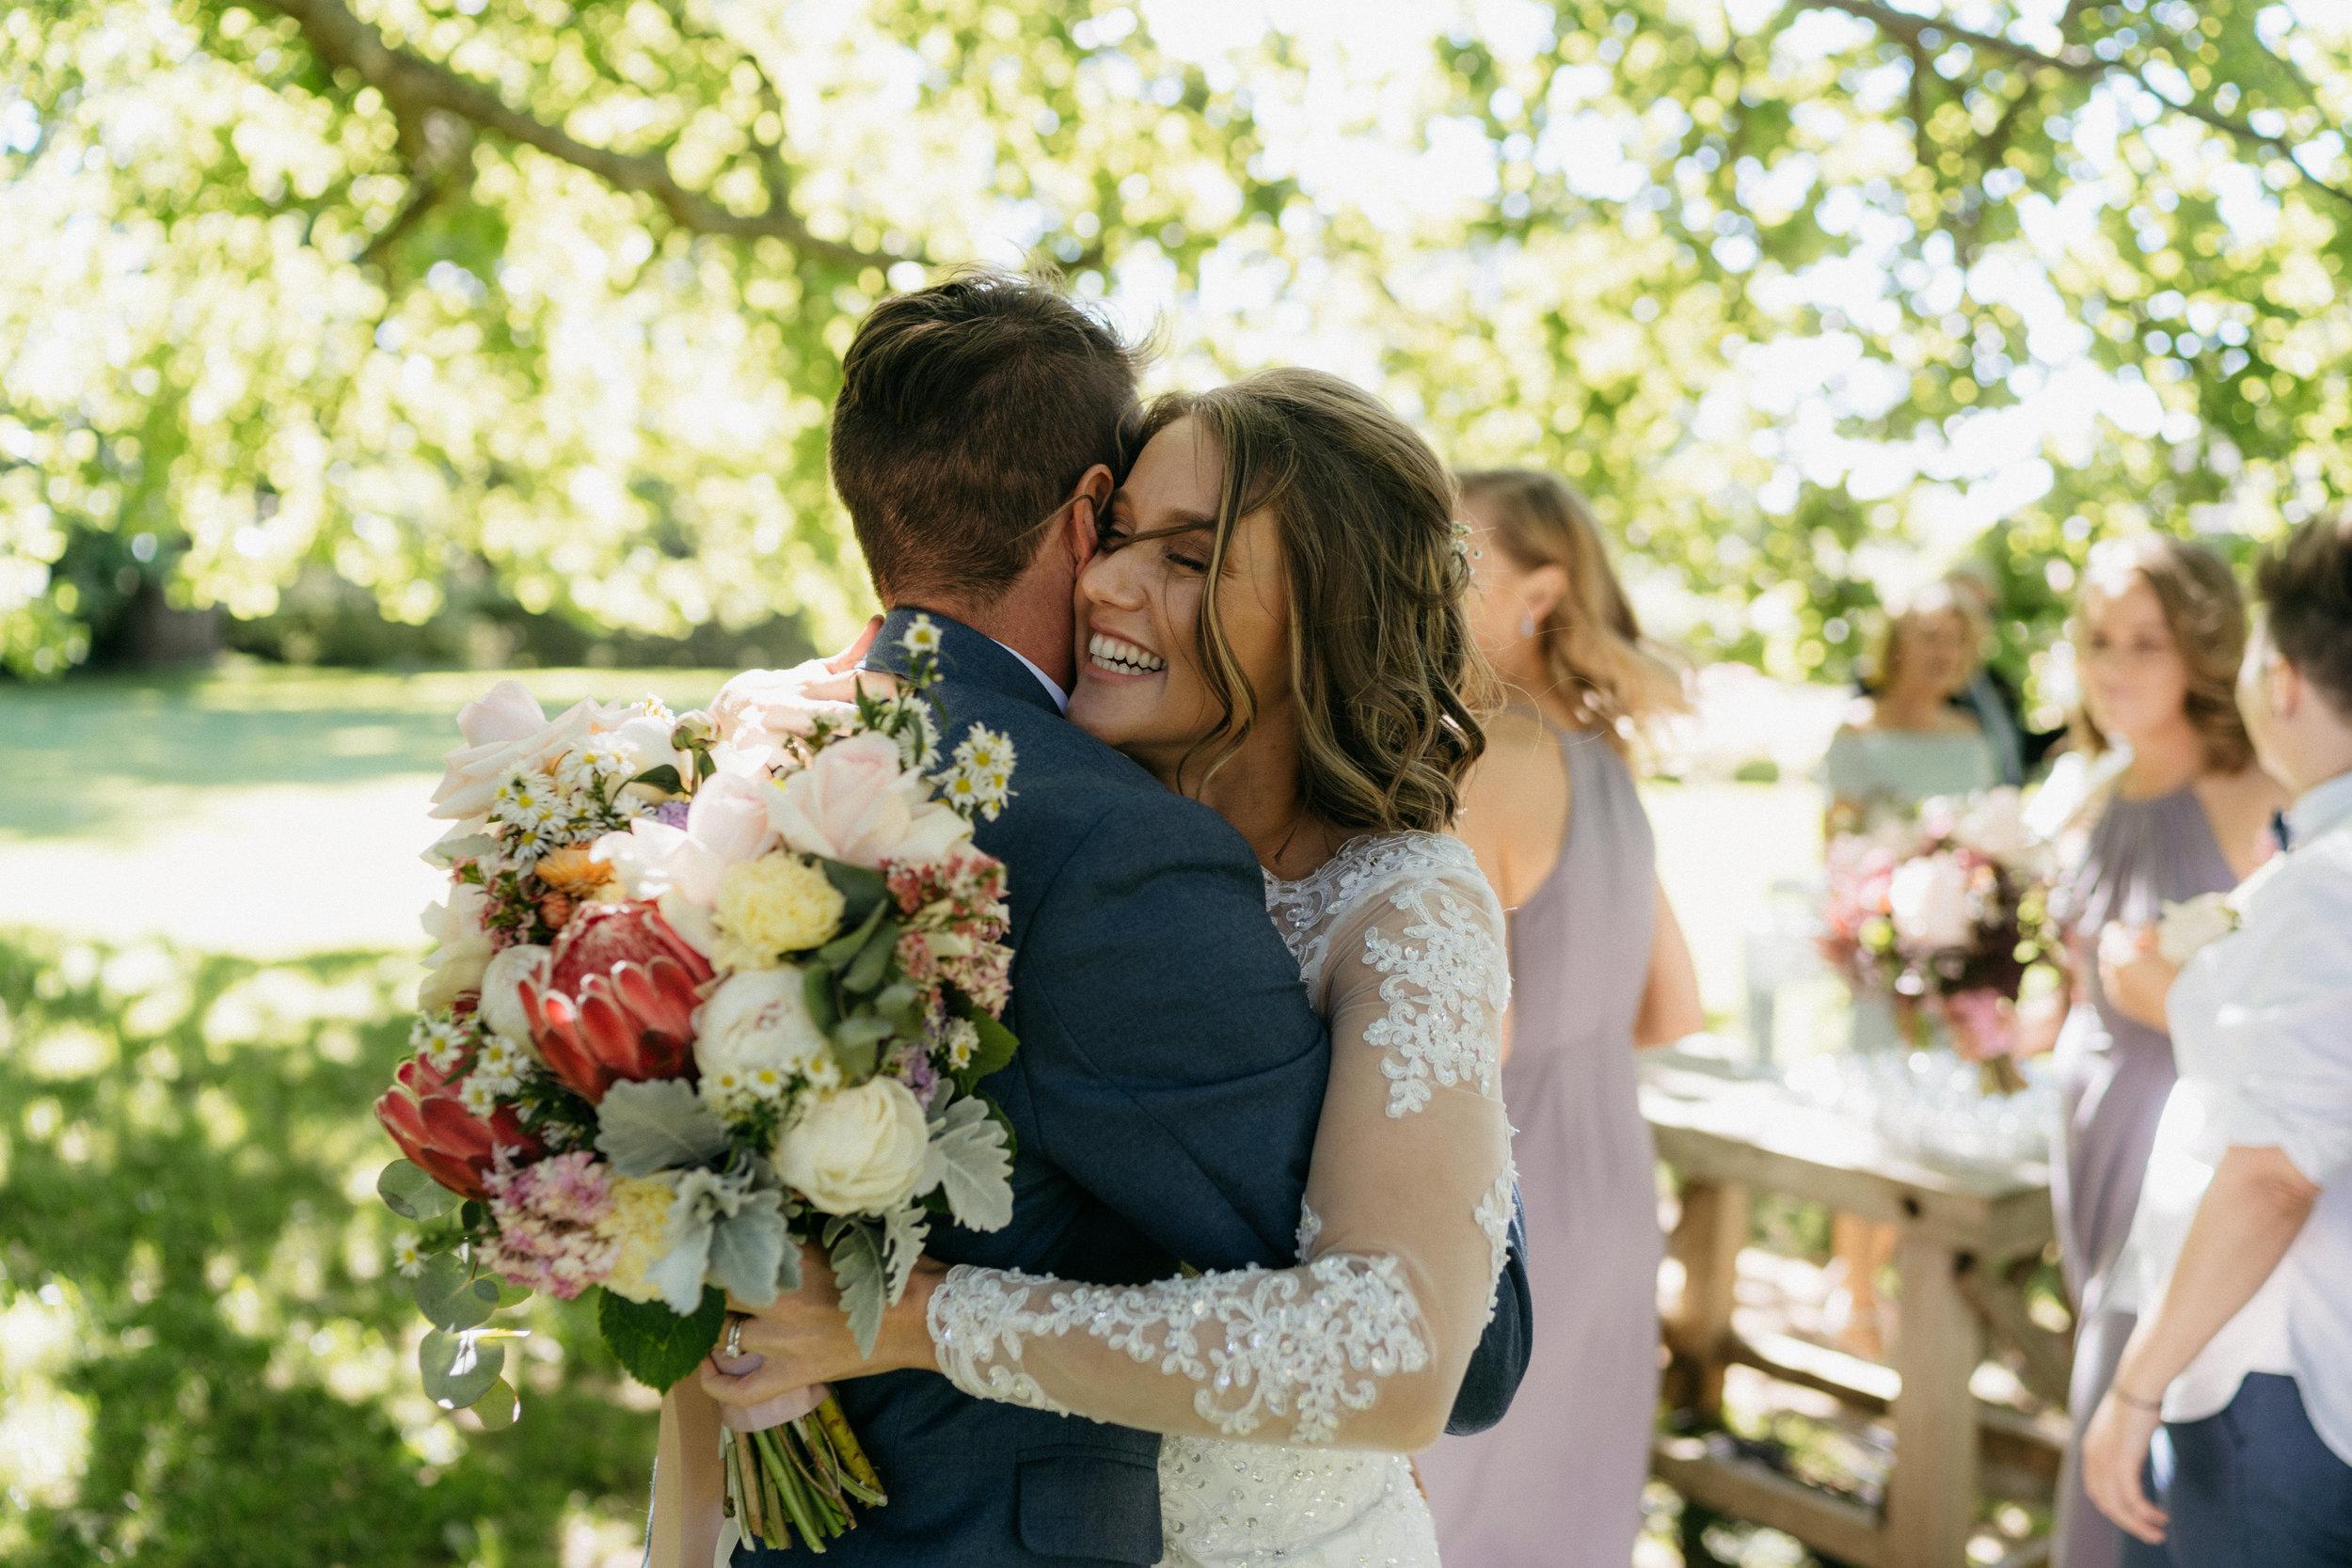 kate-lauren-wedding-213.jpg